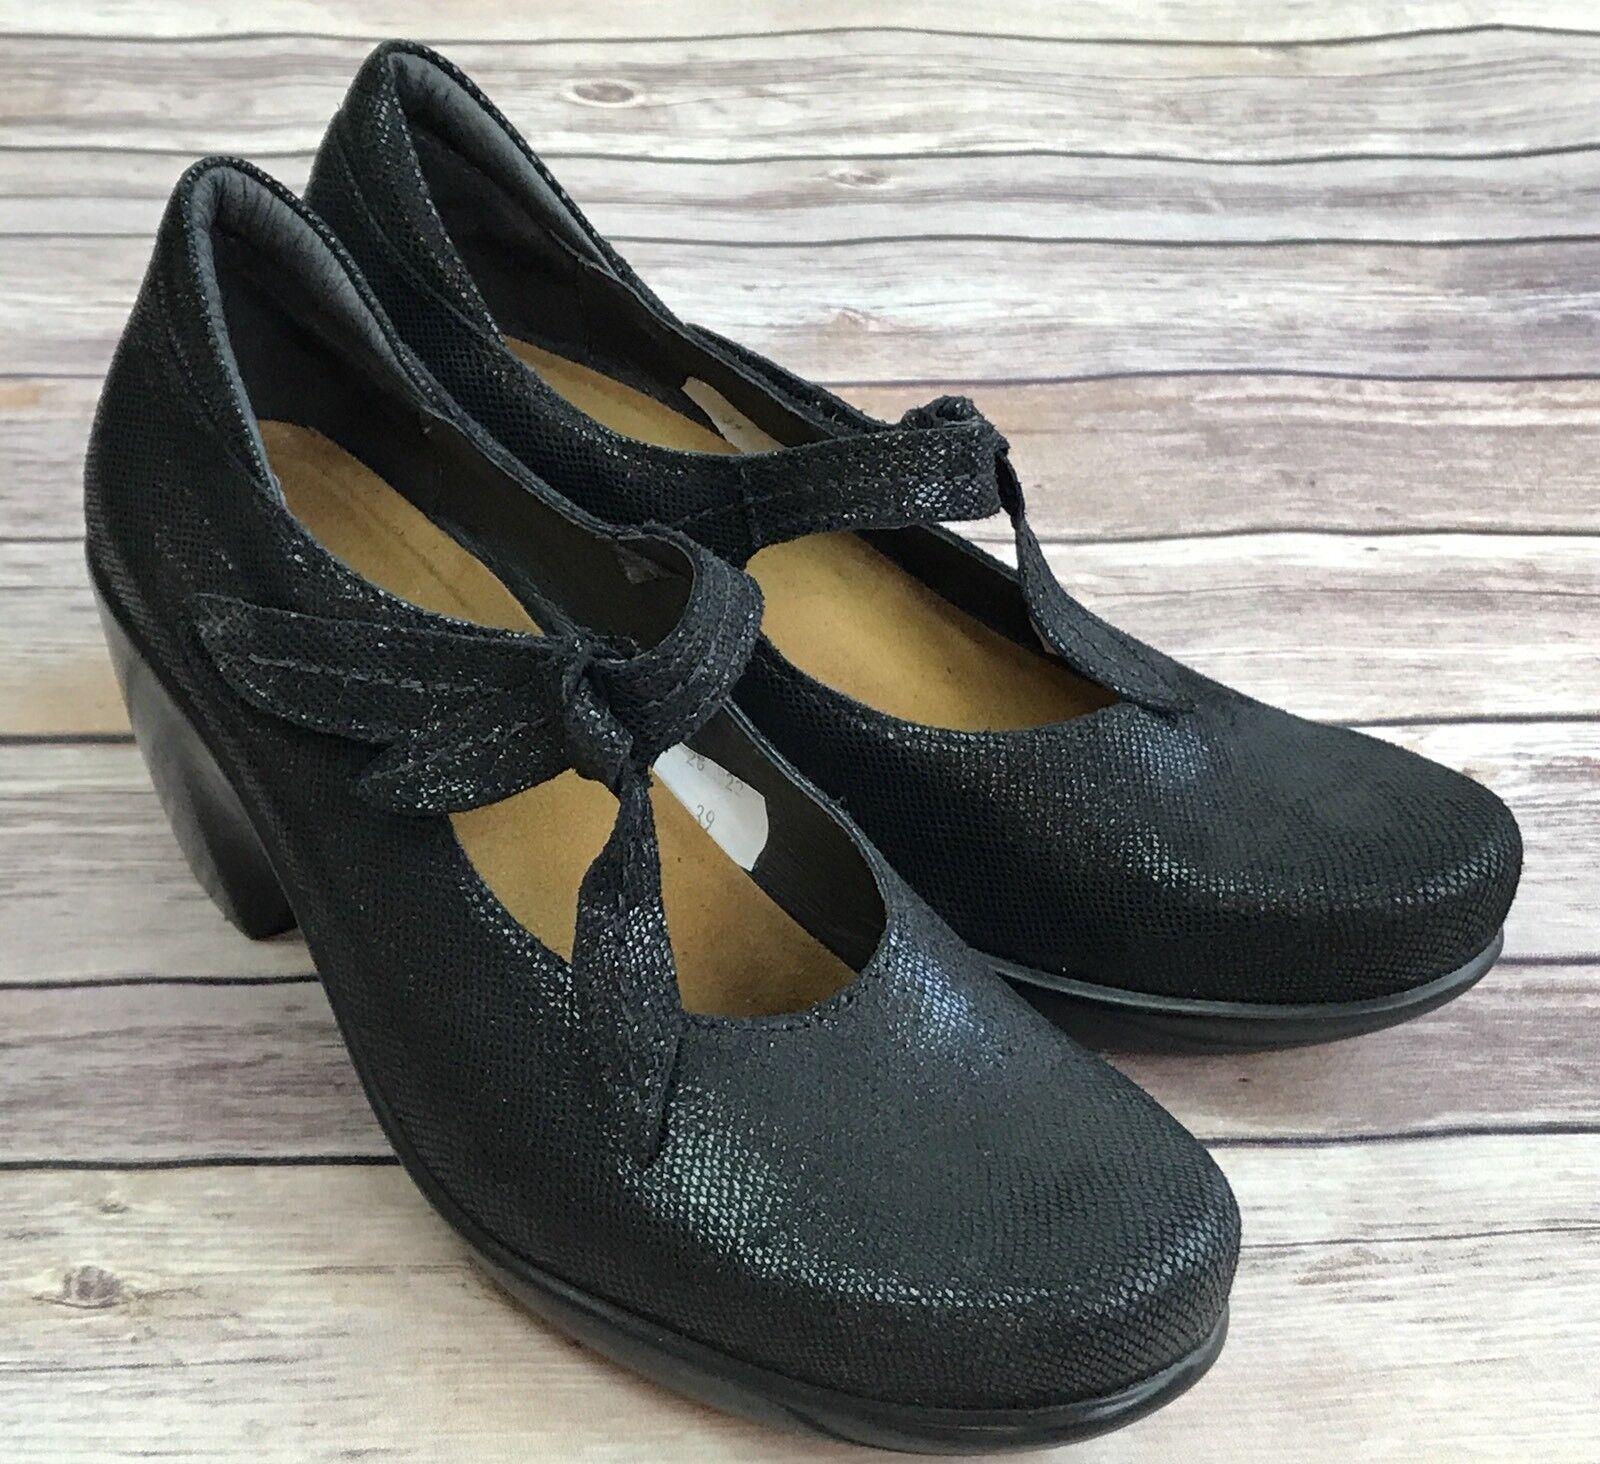 Naot Pleasure Black Shimmer Mary Jane Heels Size 8 NEW